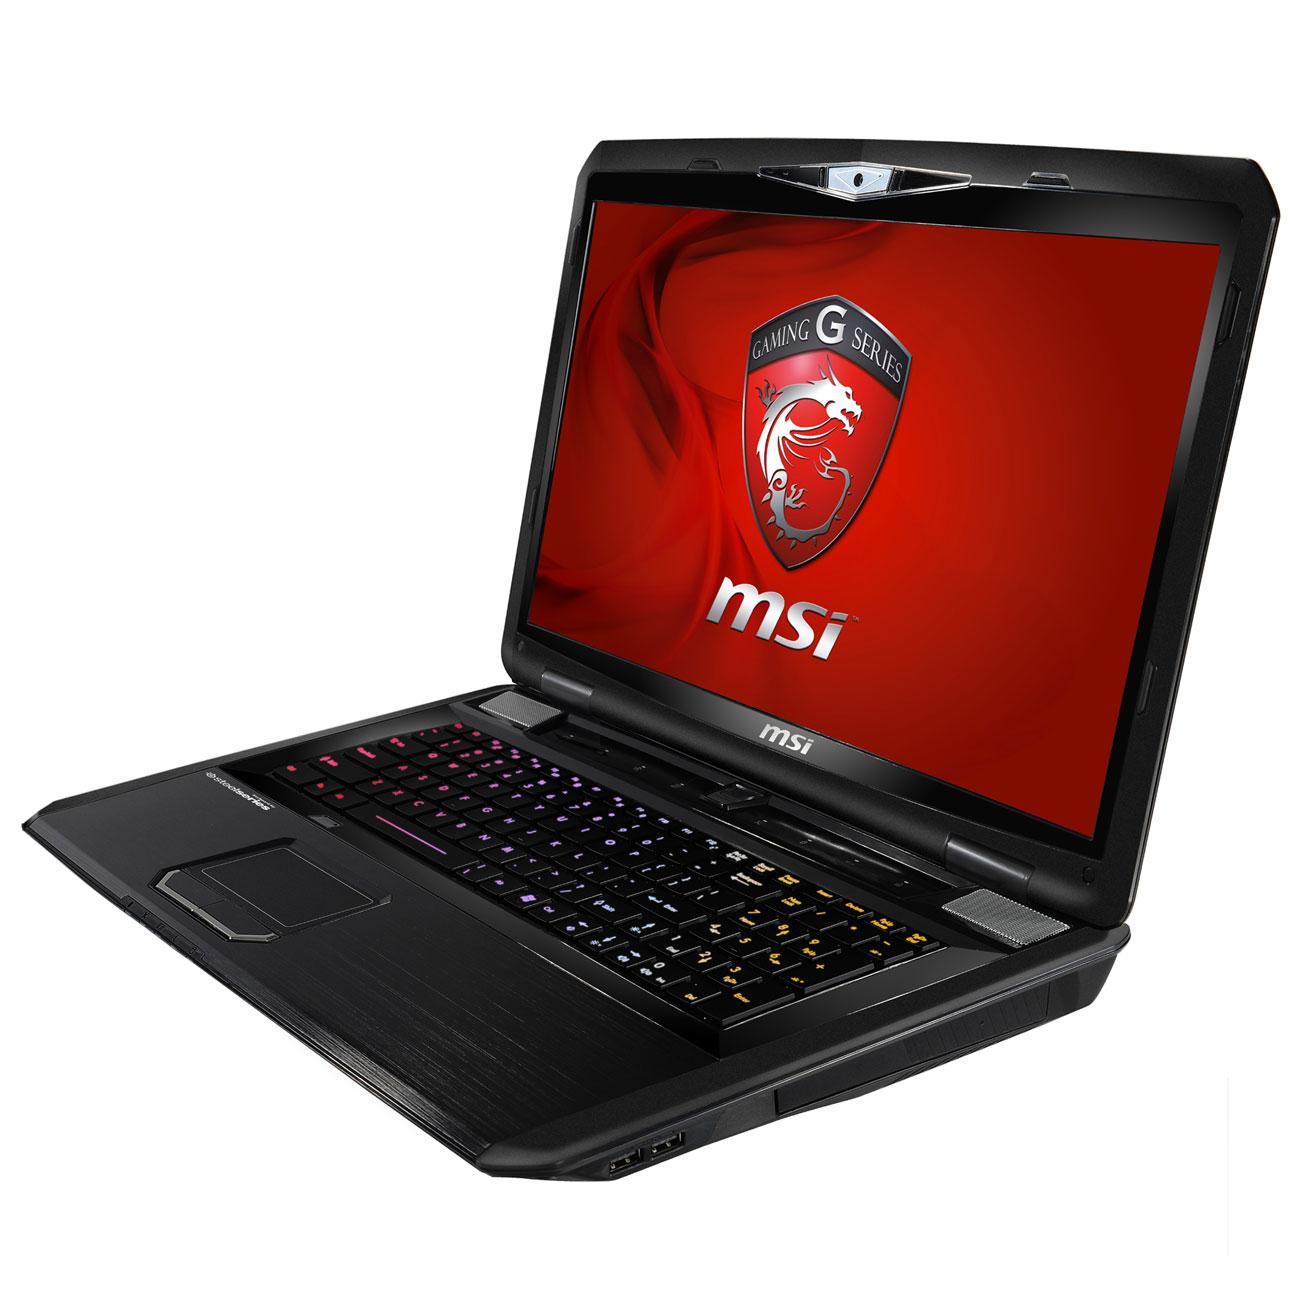 "PC portable MSI GT70 0NE-255FR Intel Core i7-3610QM 12 Go SSD 2x 64 Go + HDD 750 Go 17.3"" LED NVIDIA GeForce GTX 680M Lecteur Blu-ray/Graveur DVD Wi-Fi N/BT Webcam Windows 7 Premium 64 bits (garantie constructeur 2 ans)"